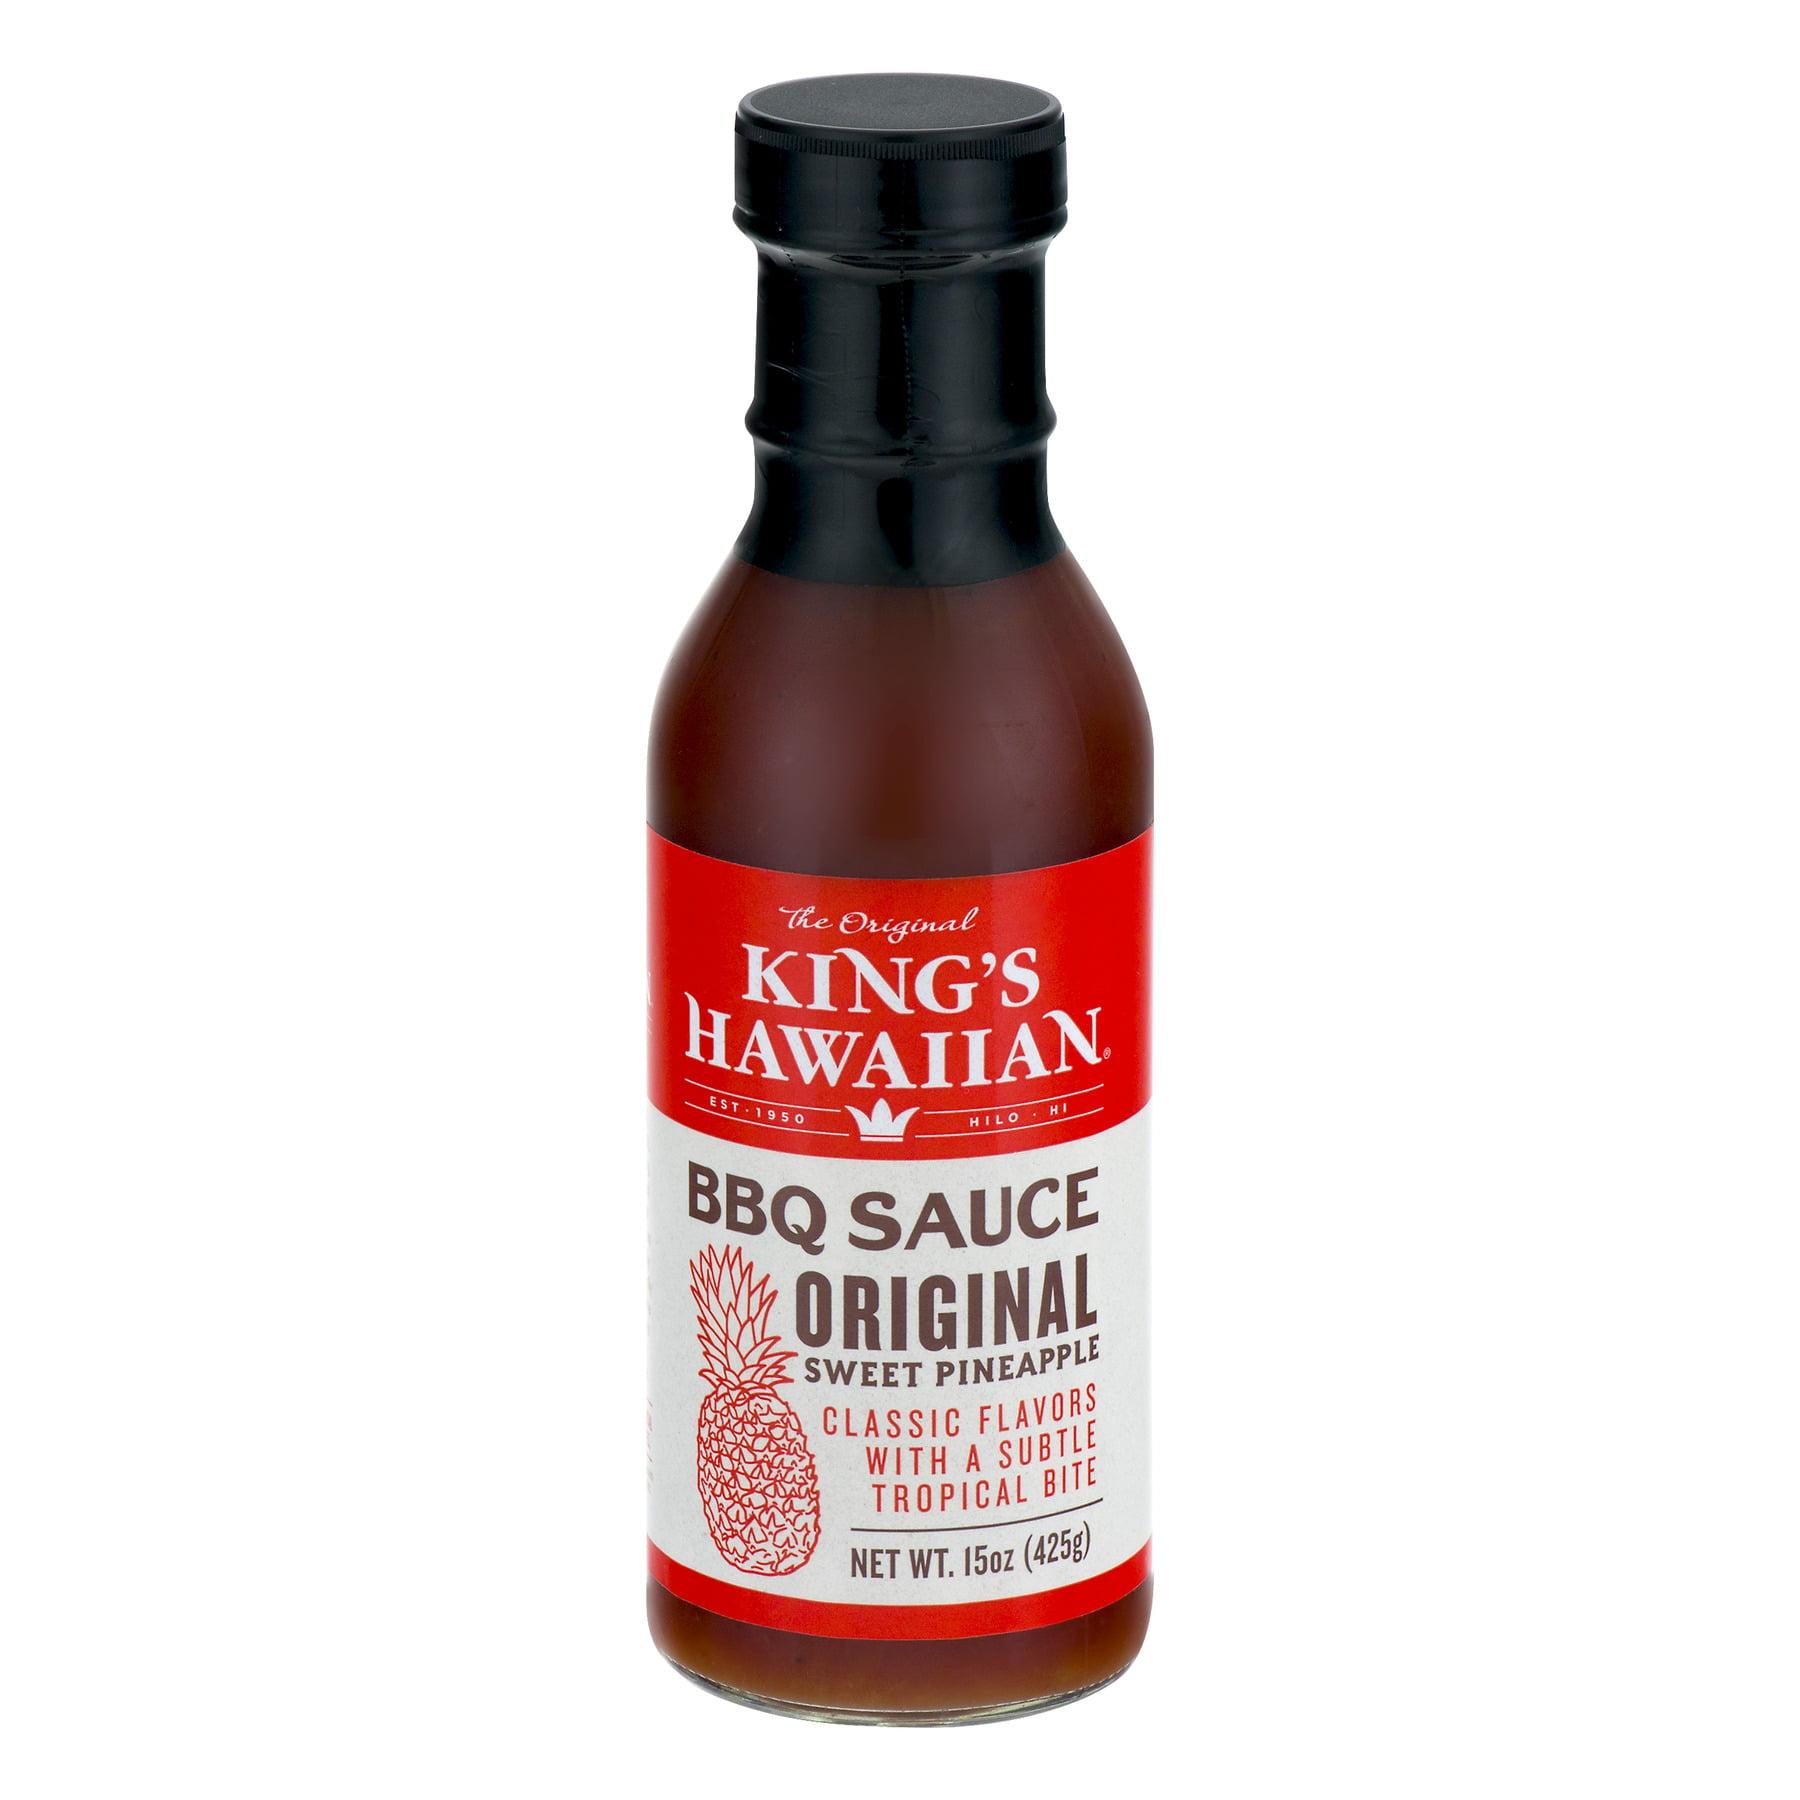 King's Hawaiian Original Sweet Pineapple Barbecue Sauce – BrickSeek